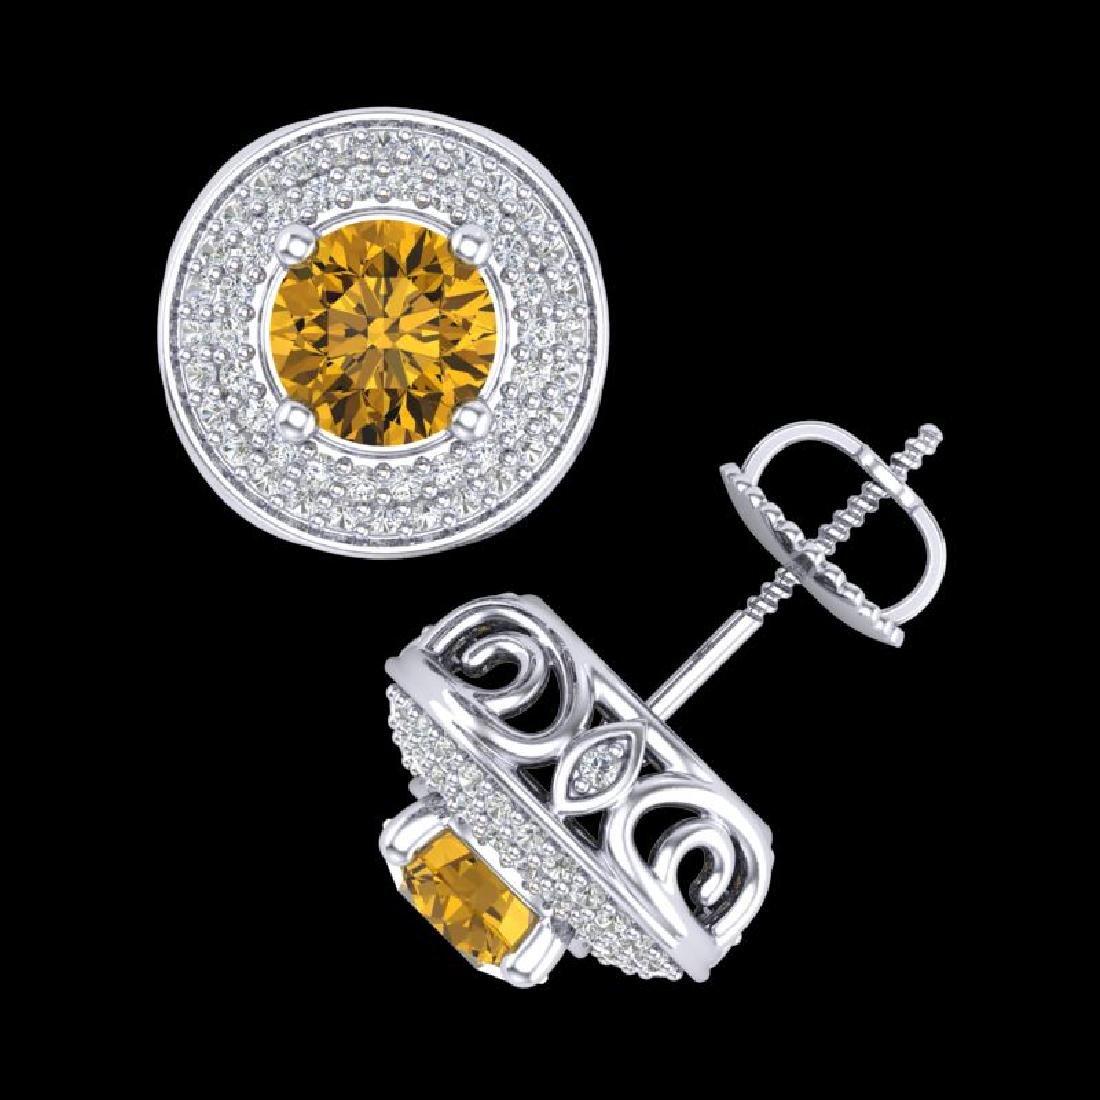 2.35 CTW Intense Fancy Yellow Diamond Art Deco Stud - 3